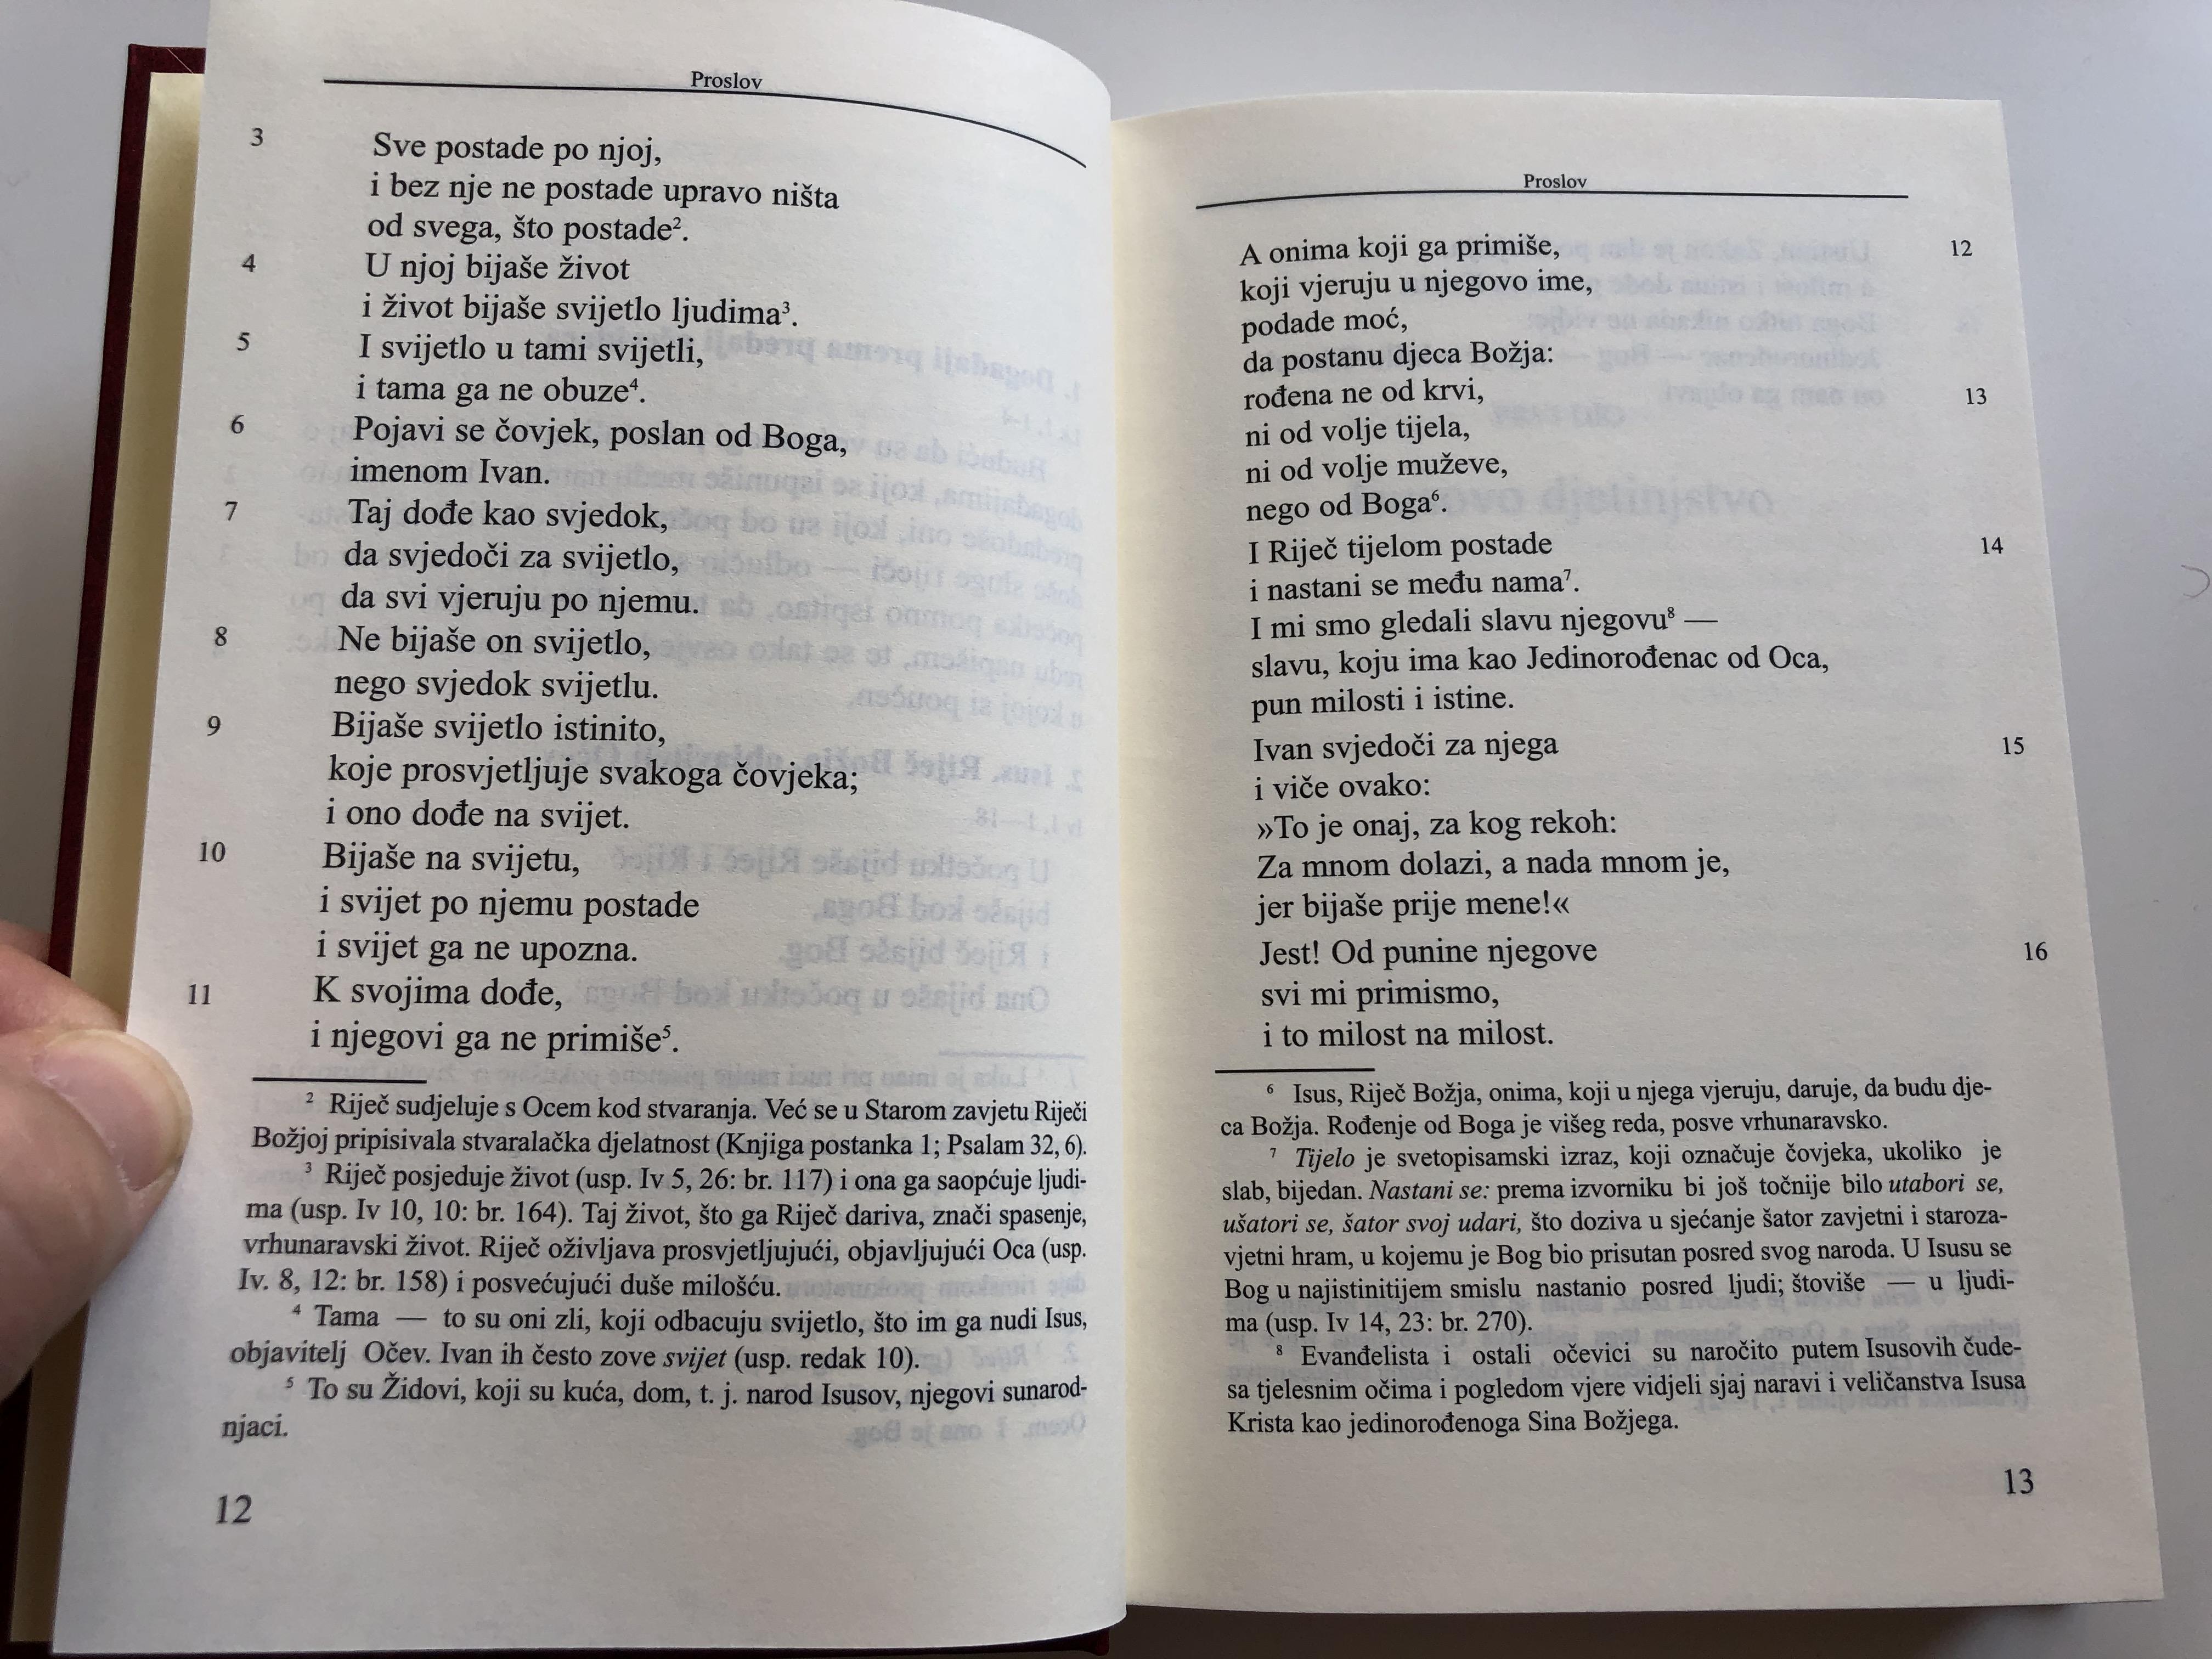 evan-elje-re-ima-etvorice-evan-elista-croatian-language-edition-of-il-vangelo-6.jpg